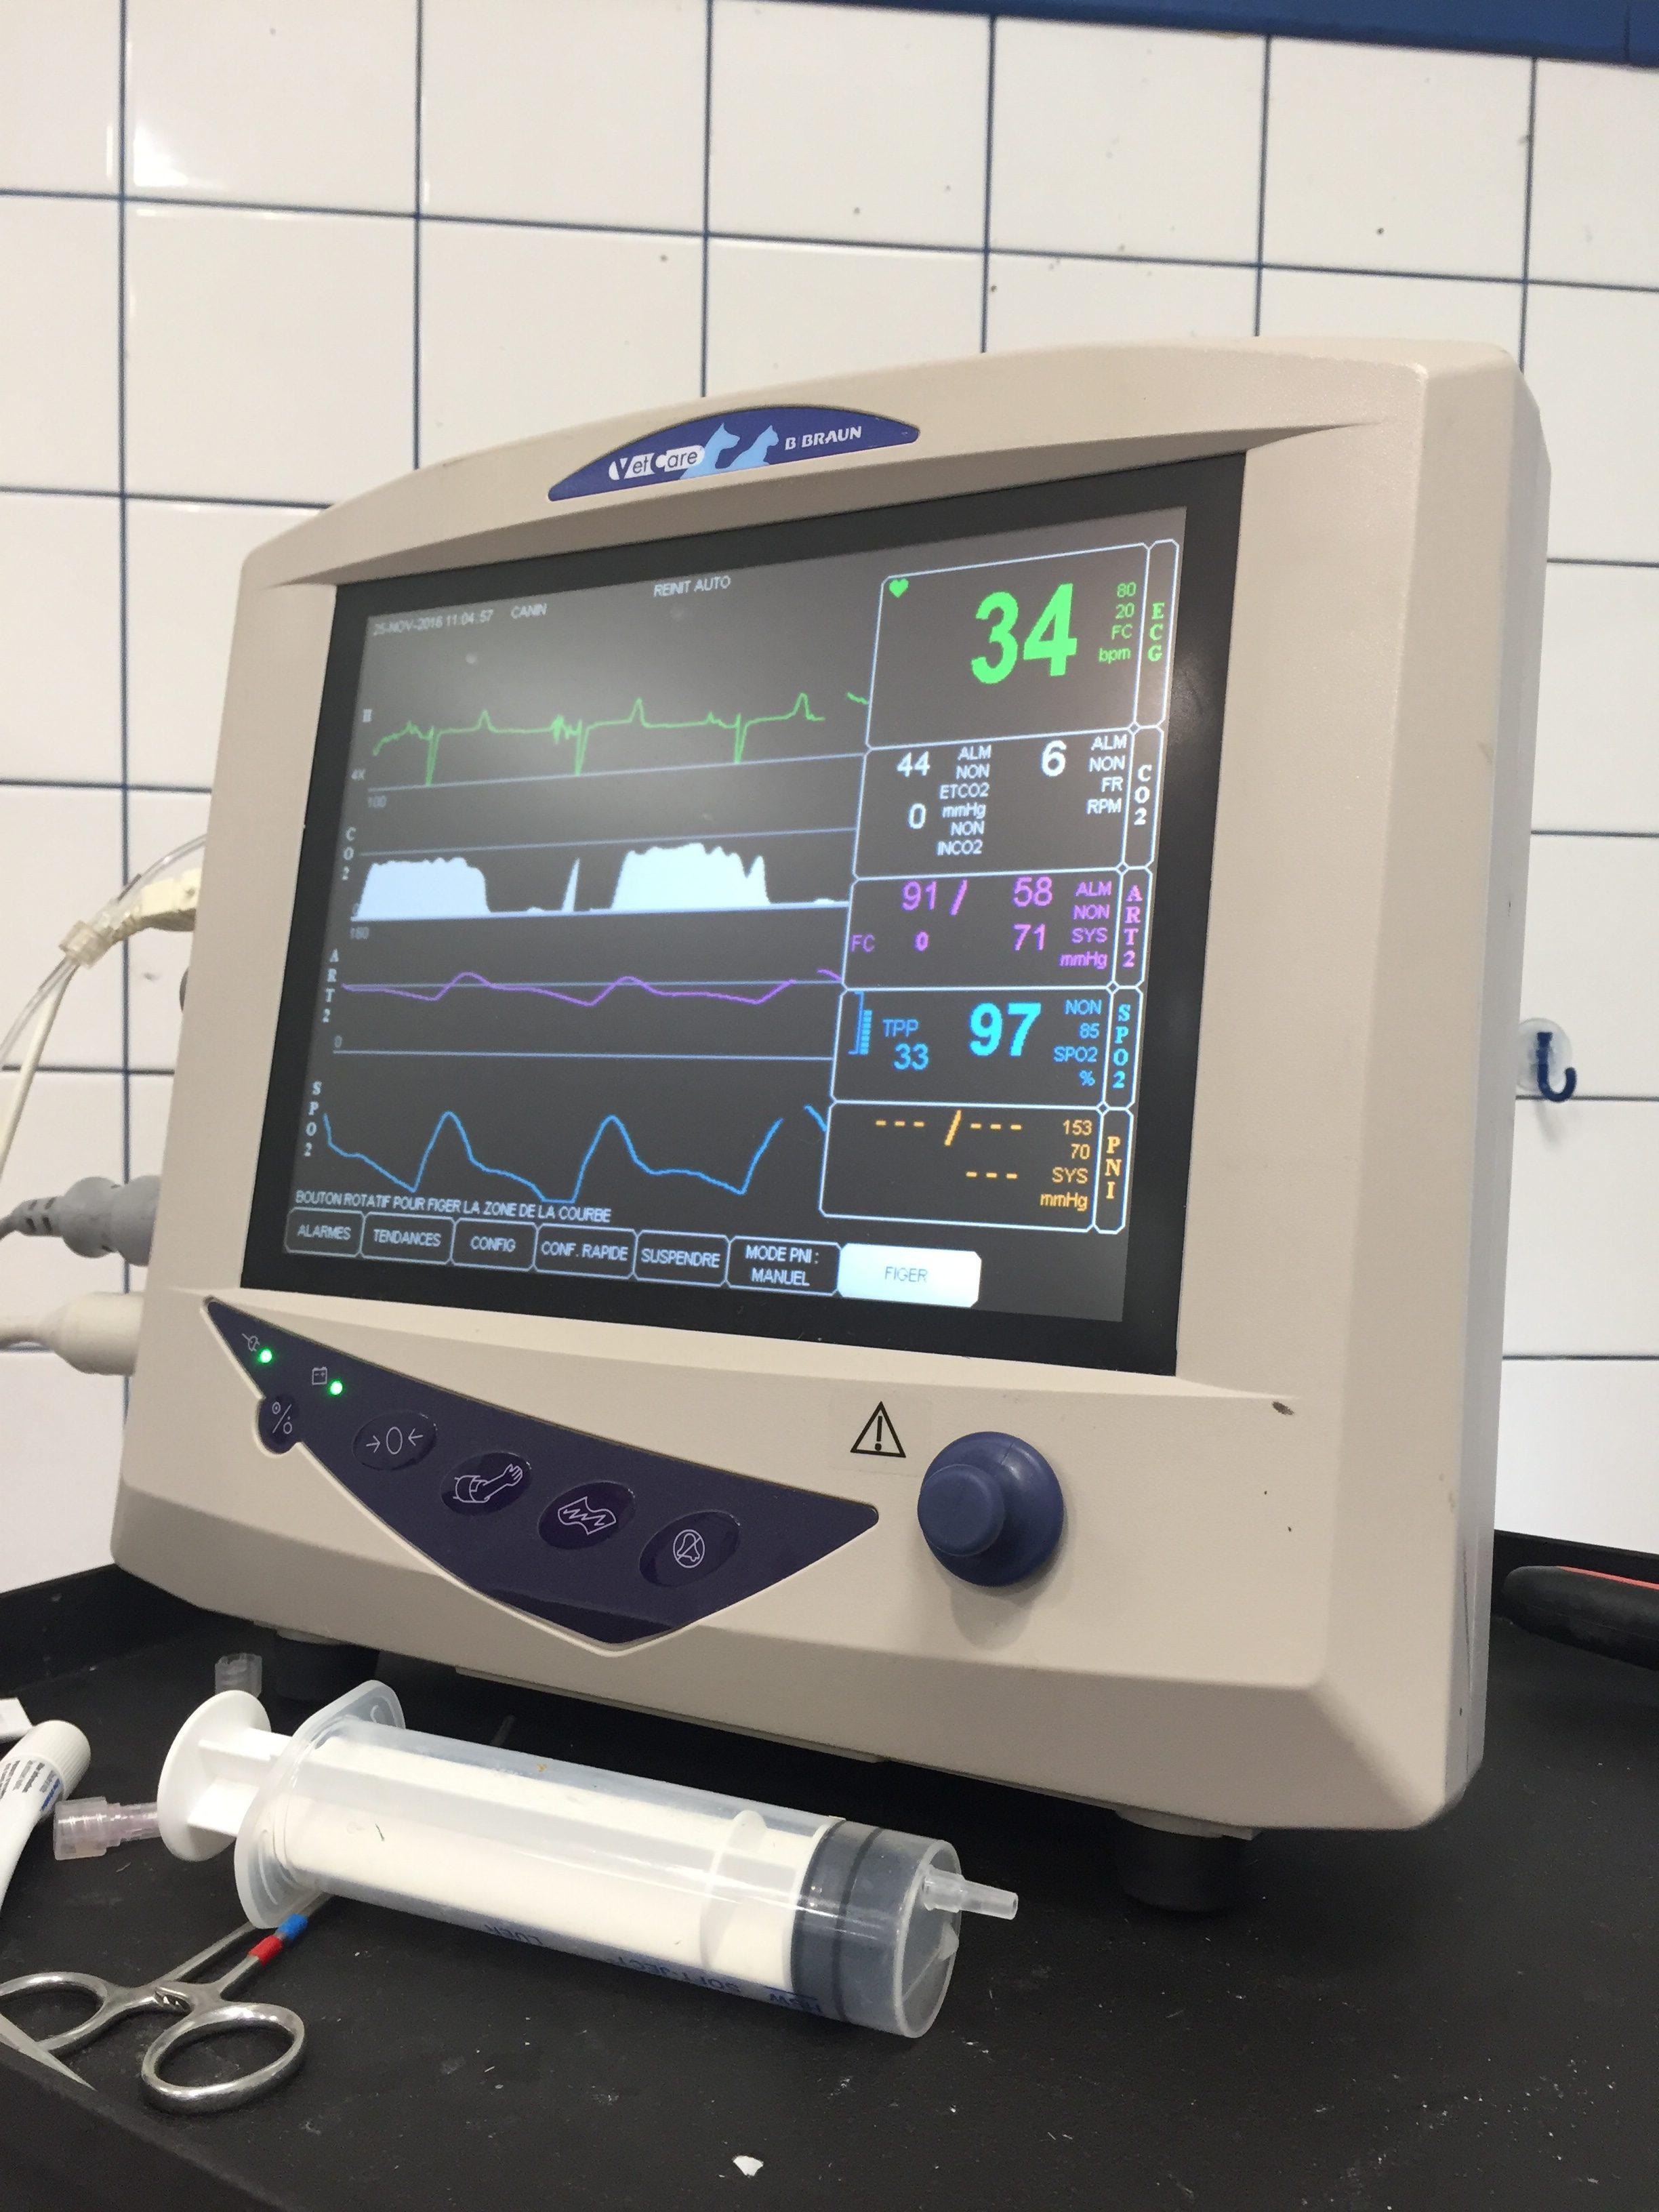 Appareil de monitoring d'anesthésie